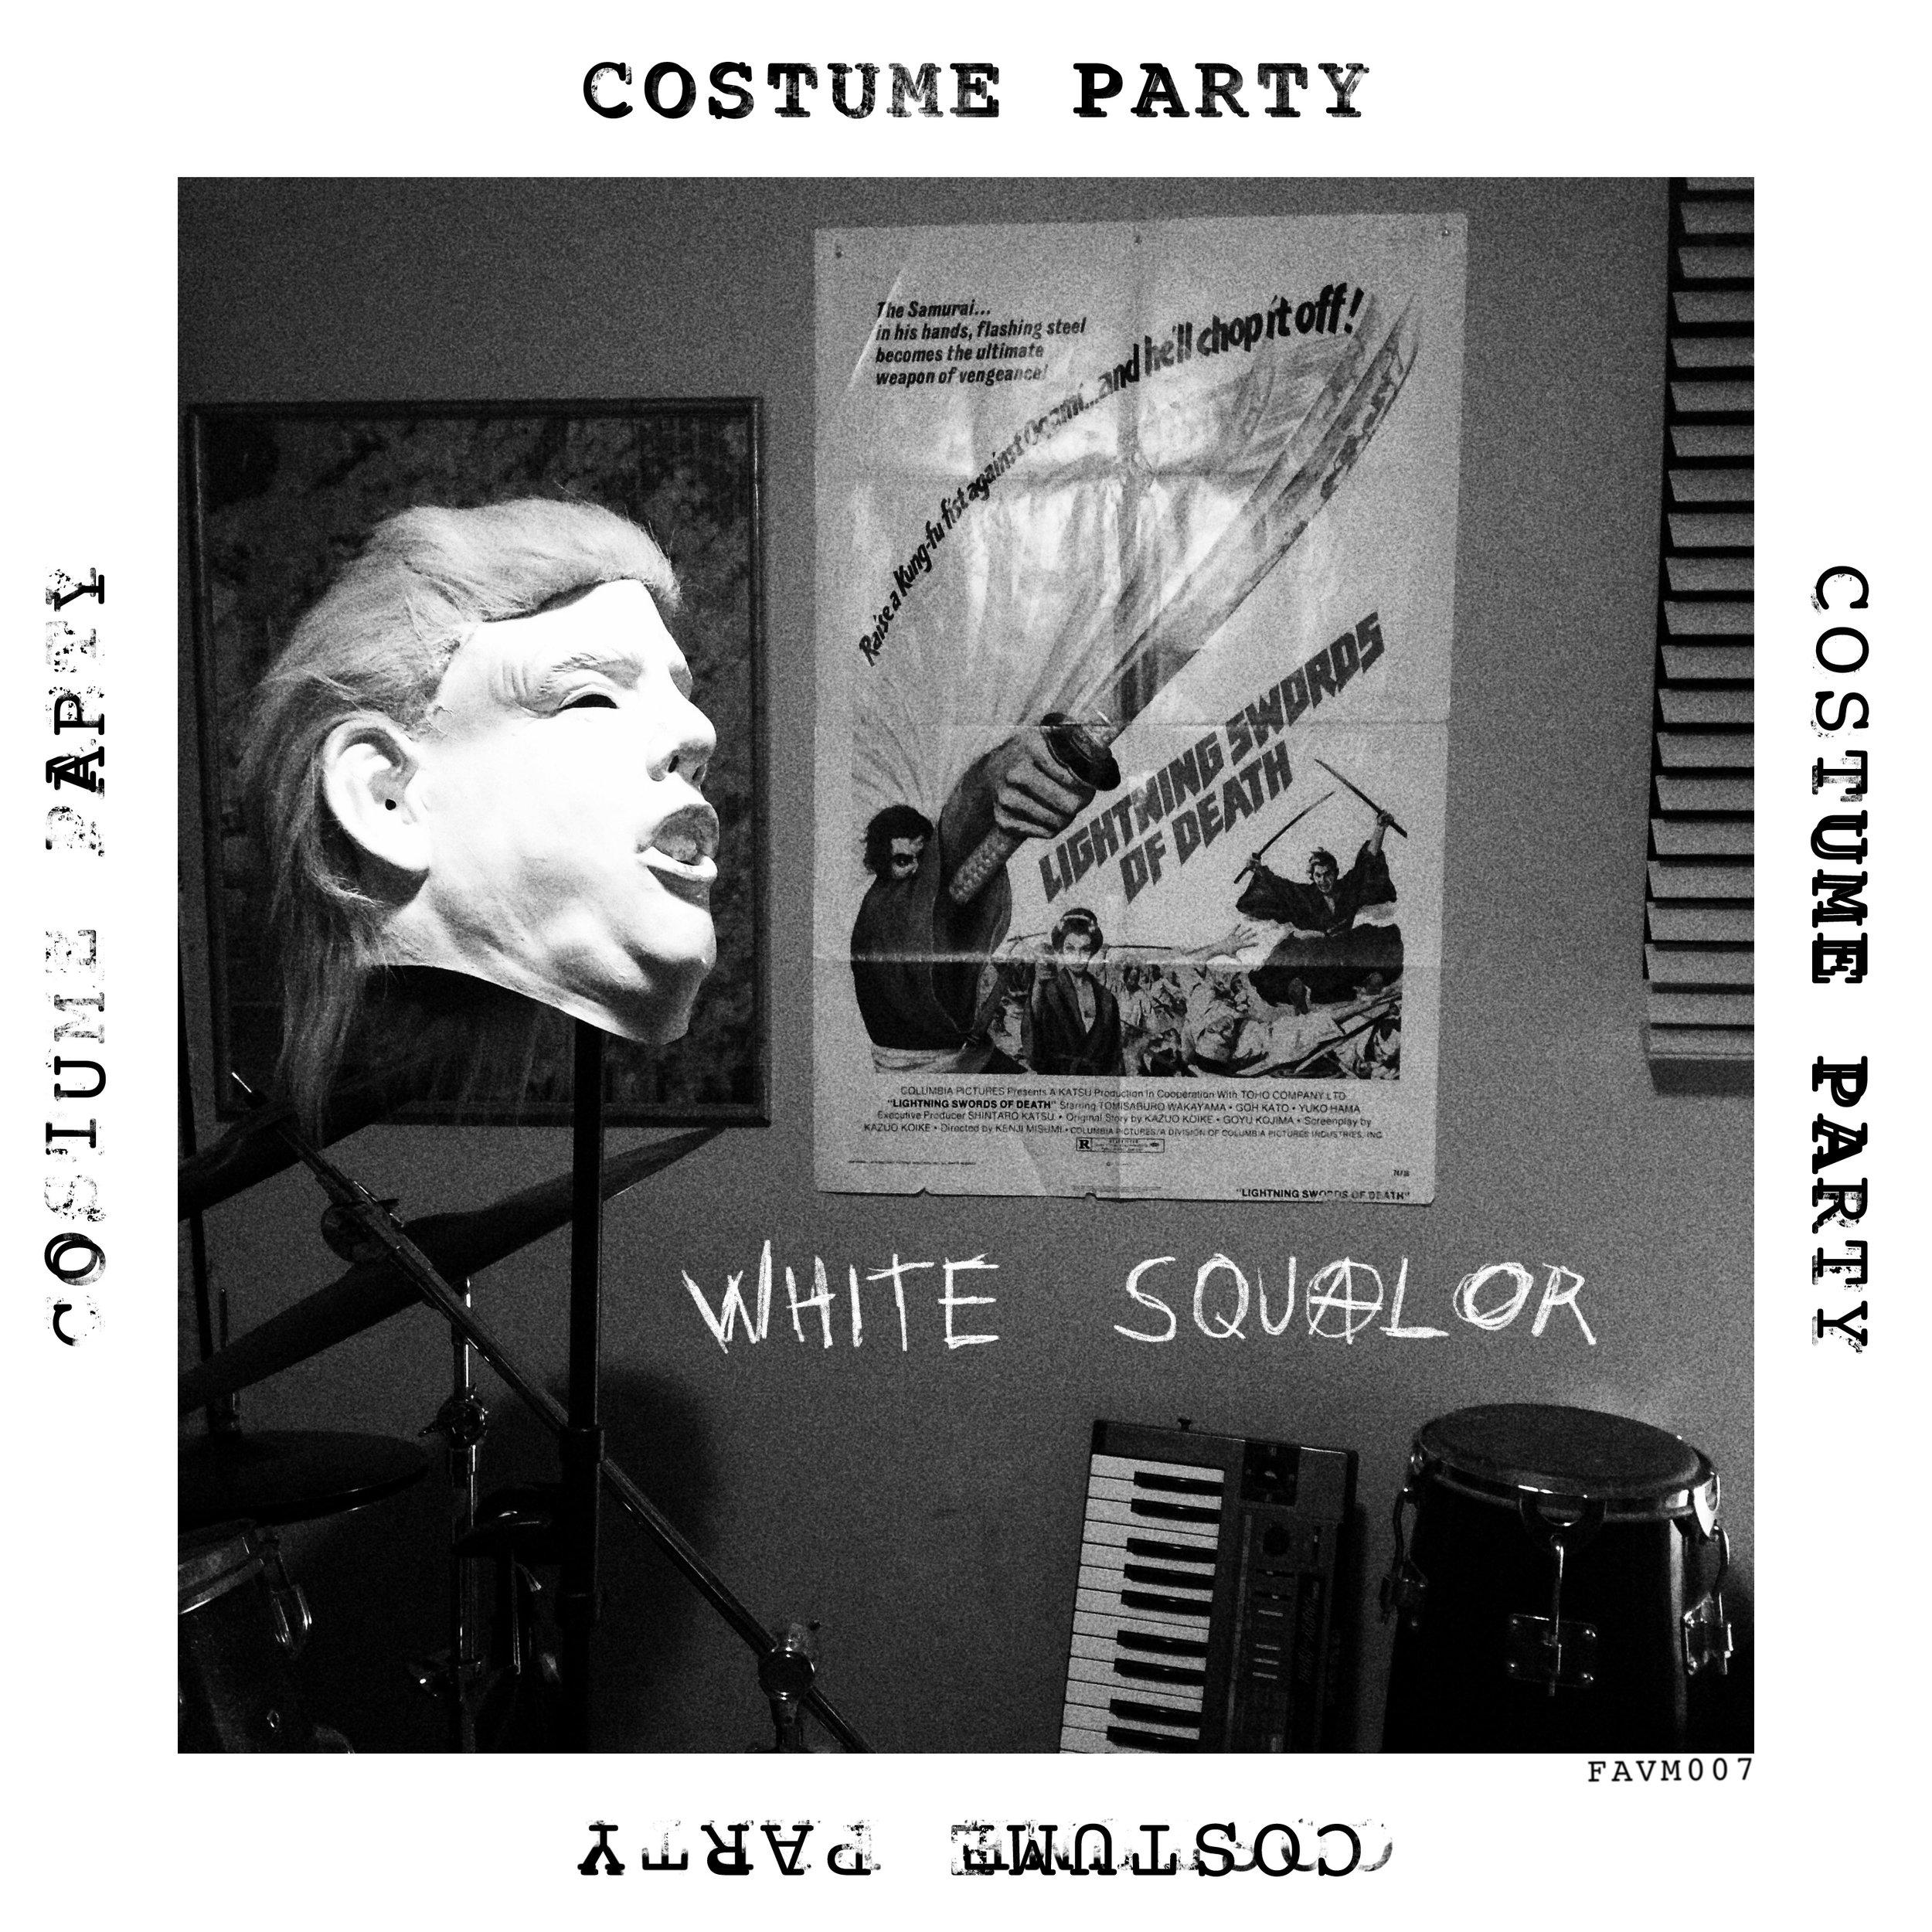 White Squalor: Costume Party Digital Download